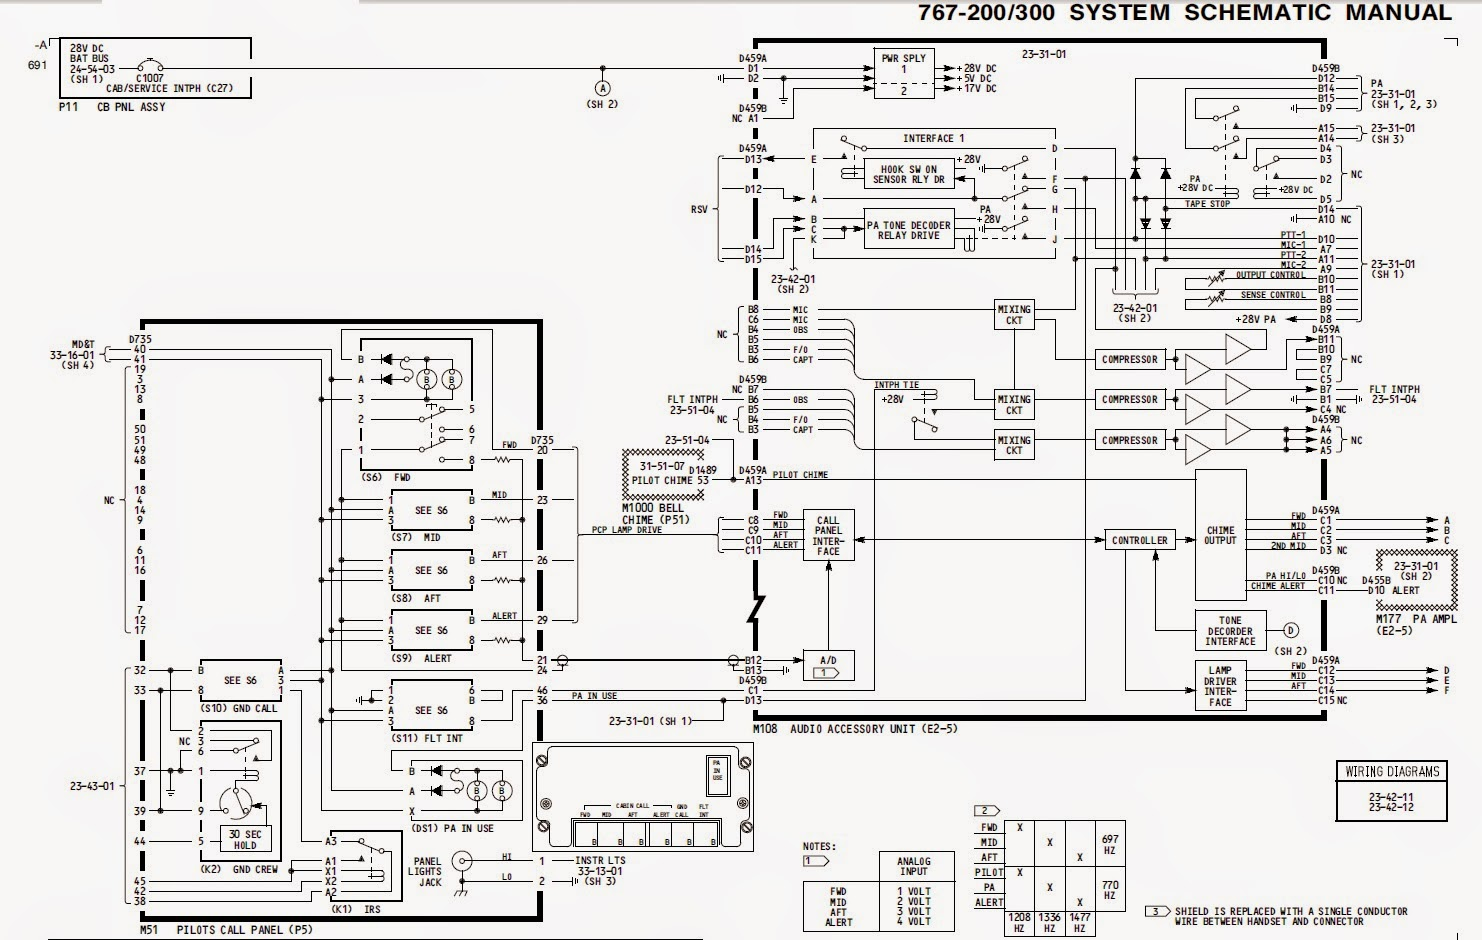 Boeing 767 Simulator Project